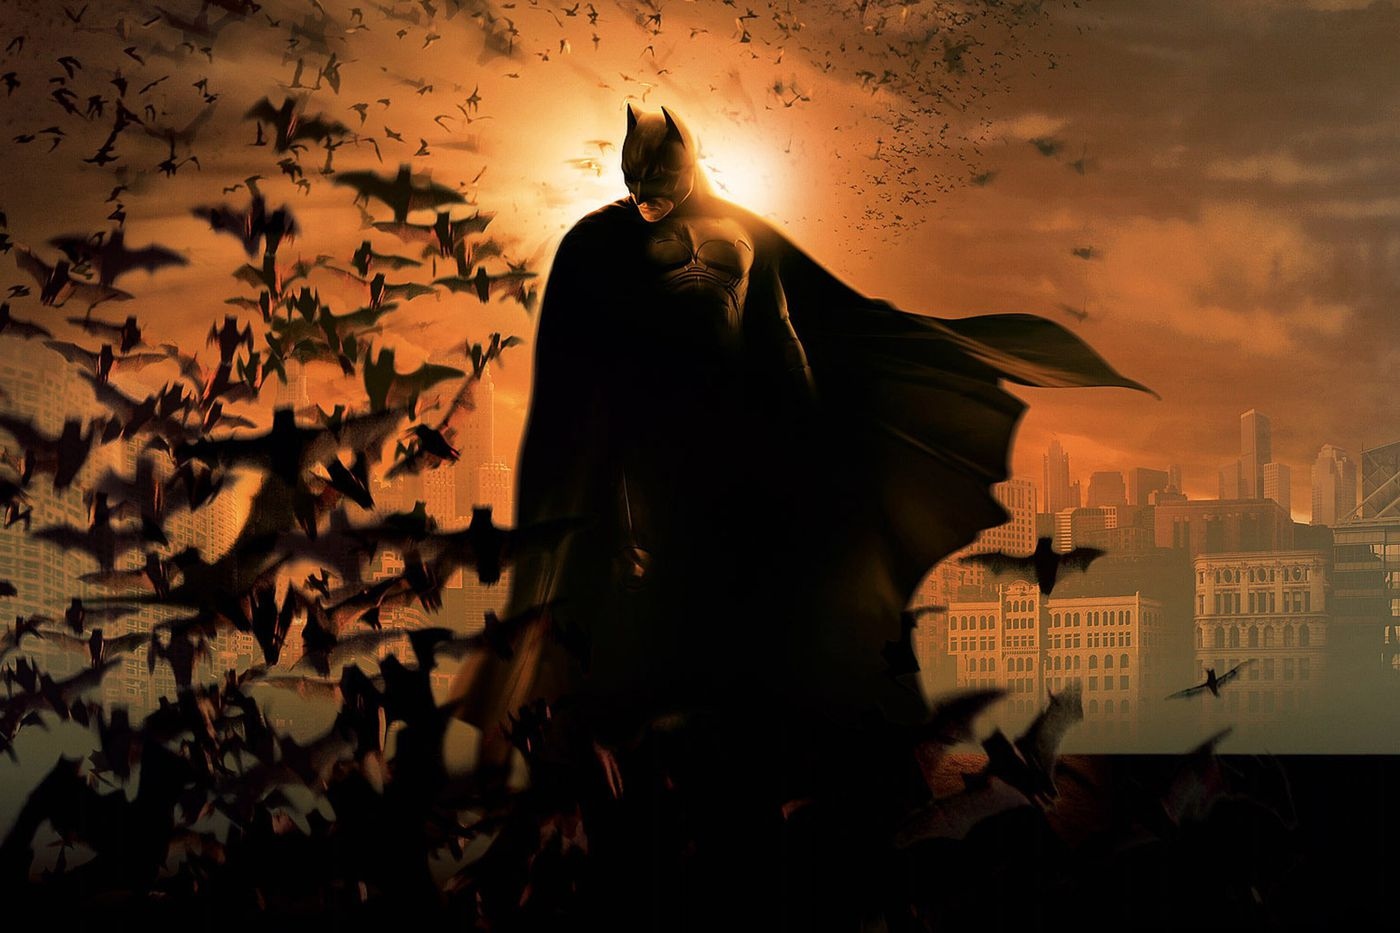 Ten years ago, Batman Begins kicked off Hollywood's gritty